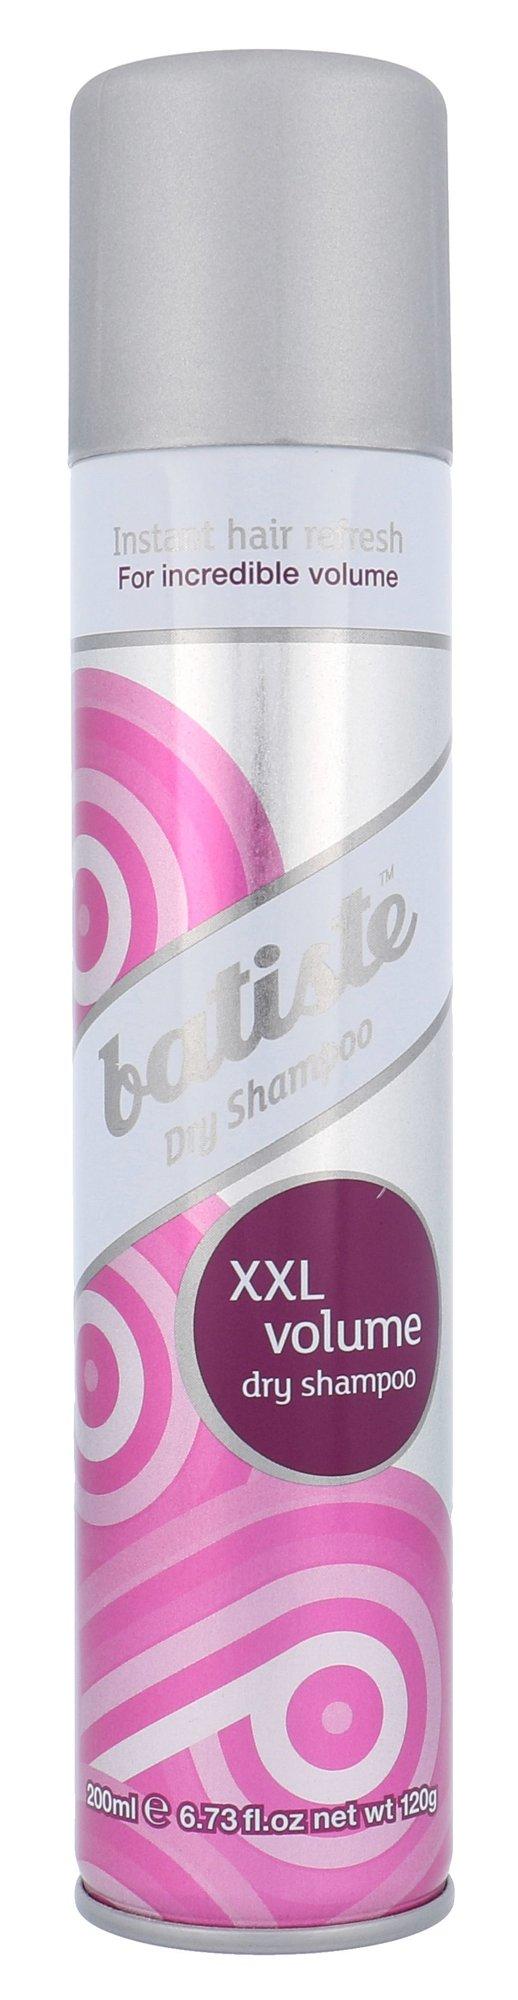 Batiste XXL Volume Cosmetic 200ml